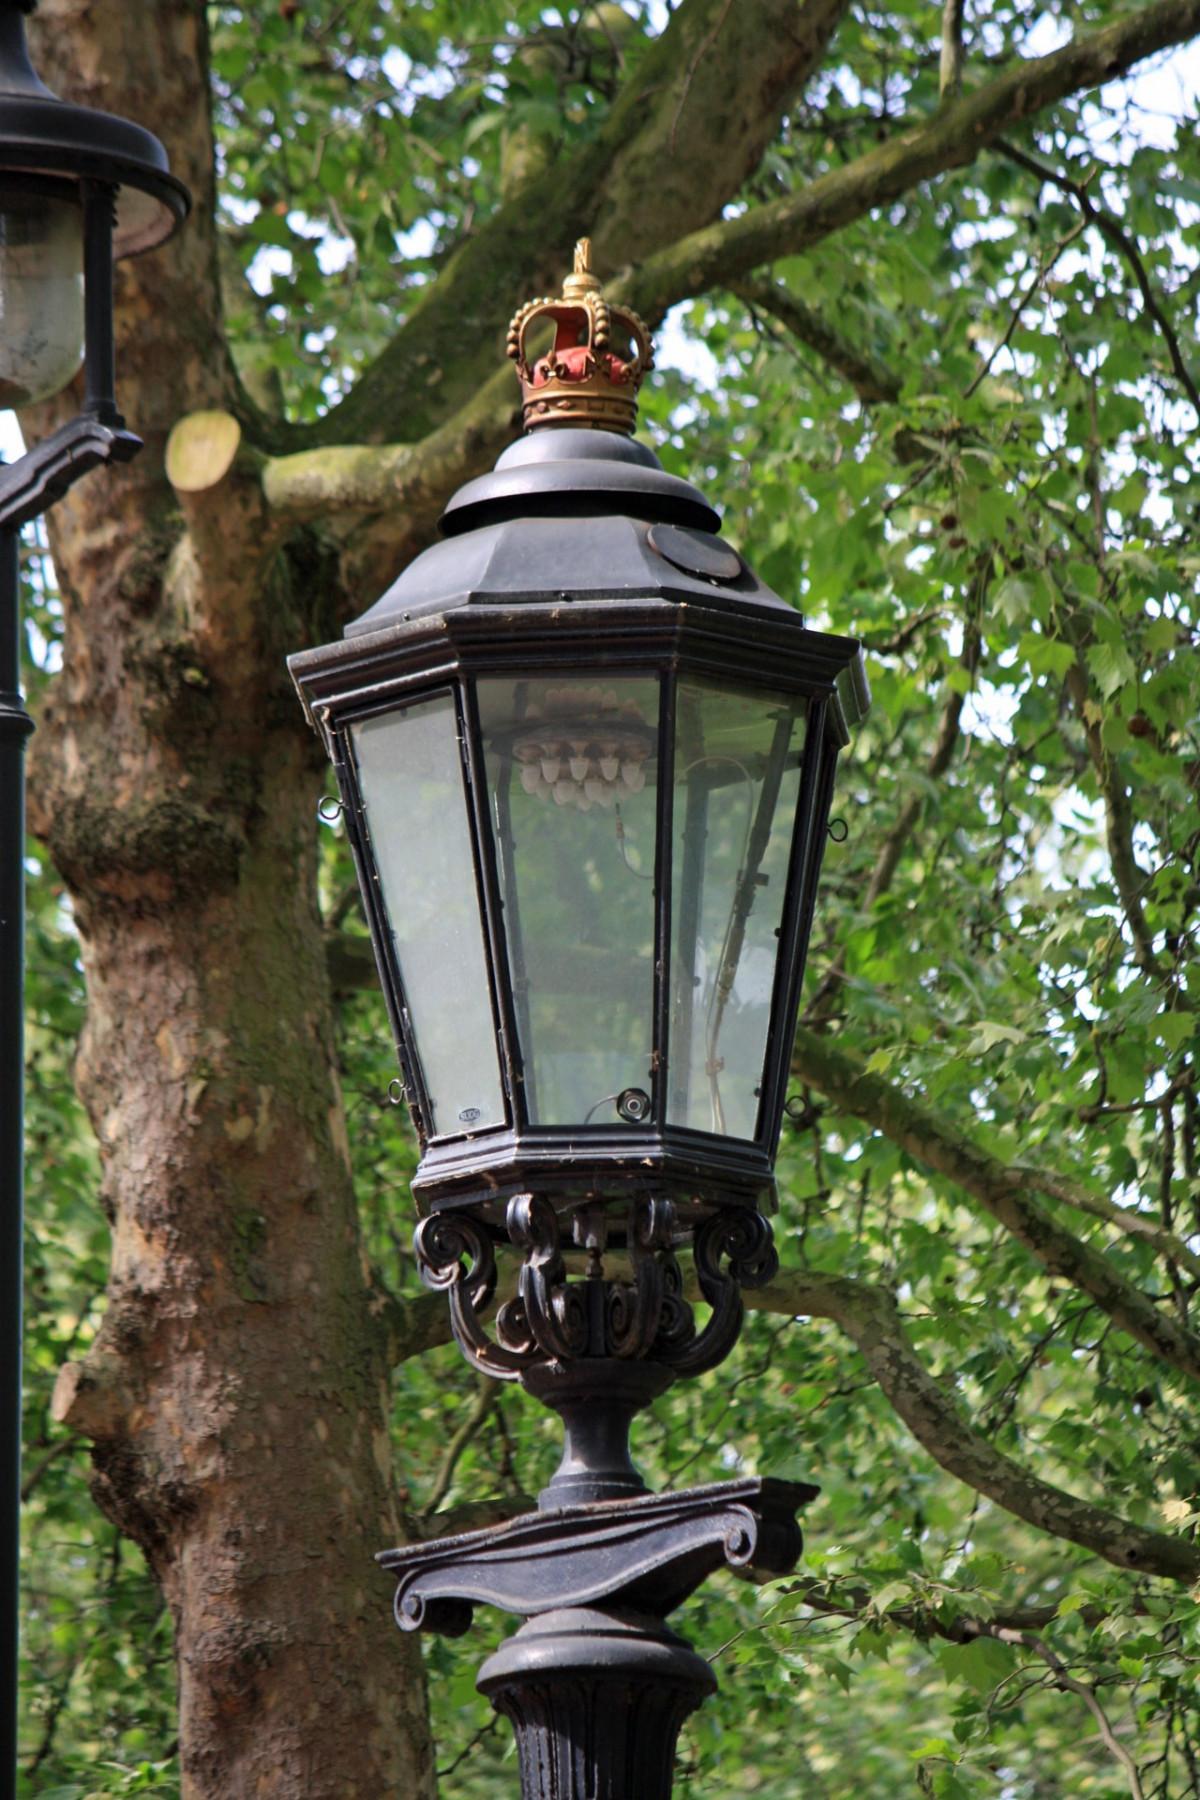 Free Images Sky Old Street Light Lighting Street